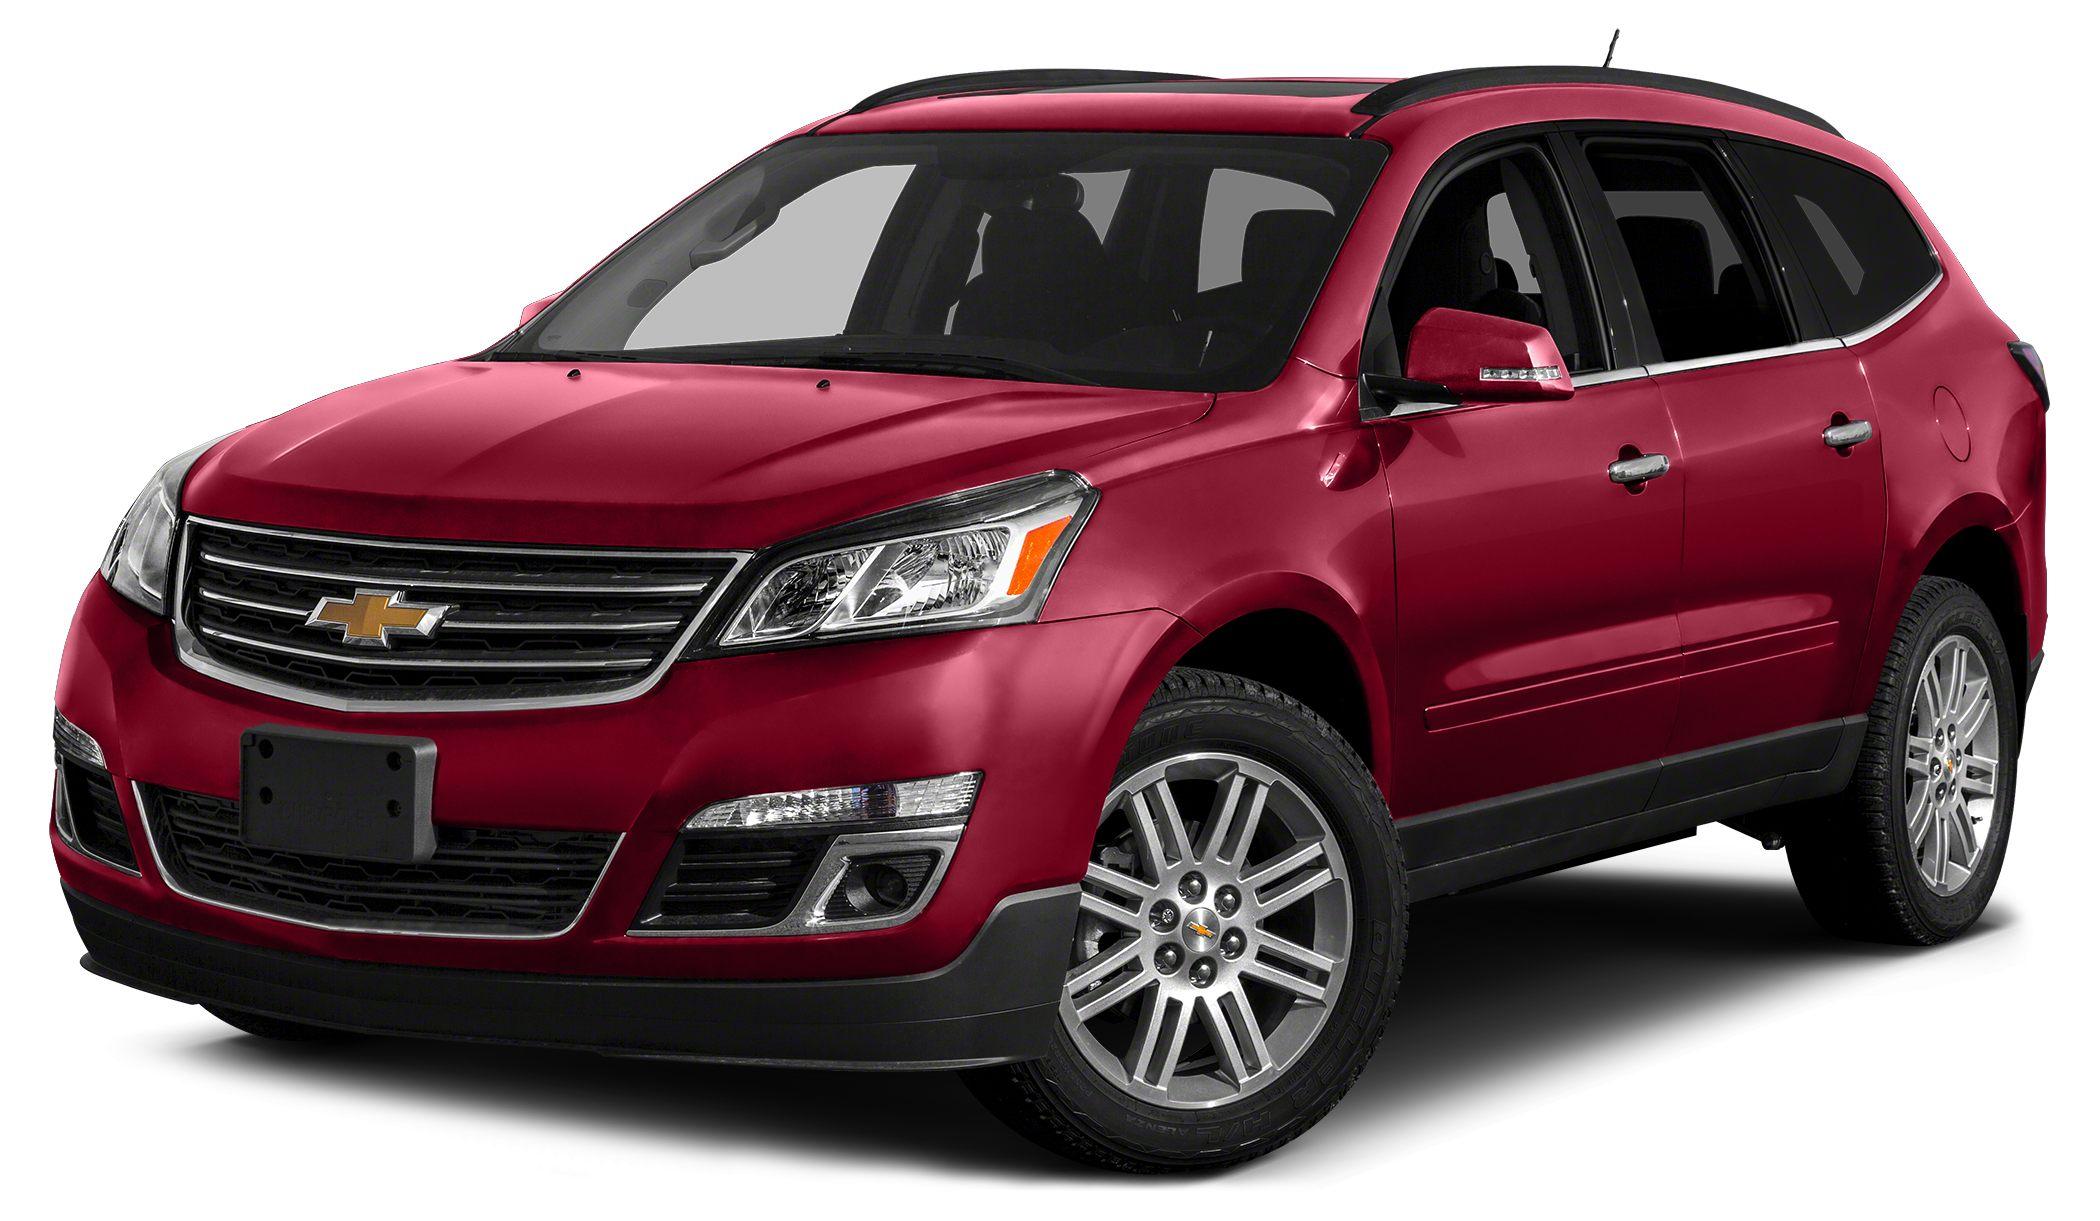 2016 Chevrolet Traverse LT w1LT Color Siren Red Tintcoat Stock 0STNBZ5 VIN 1GNKRGKDXGJ153634